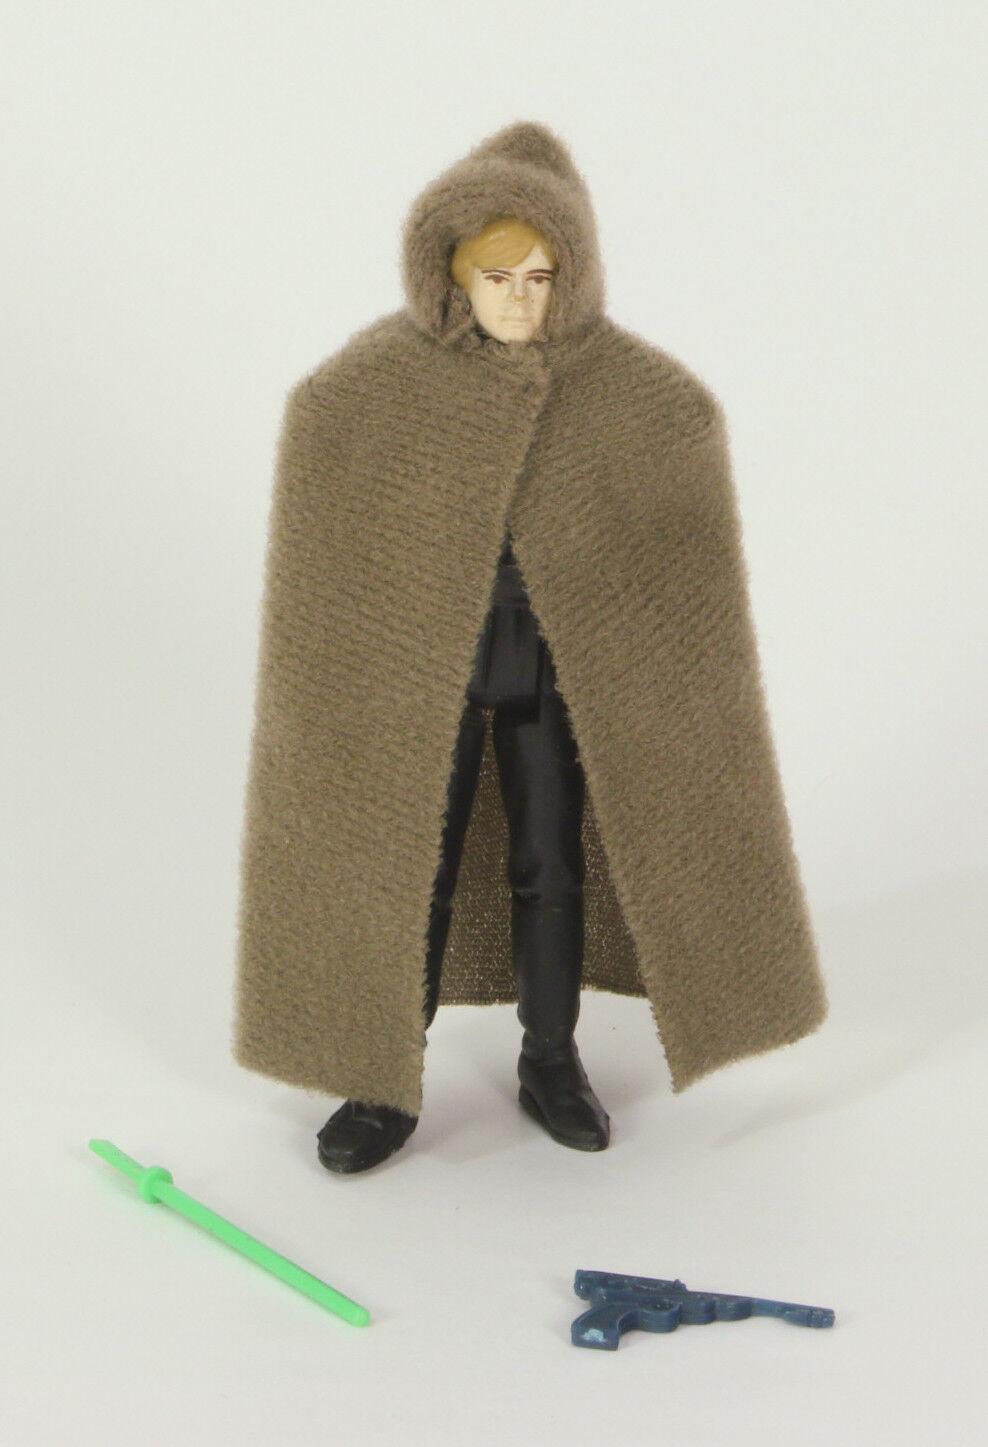 Vintage Star Wars Loose Luke Skywalker Jedi Knight Very Nice